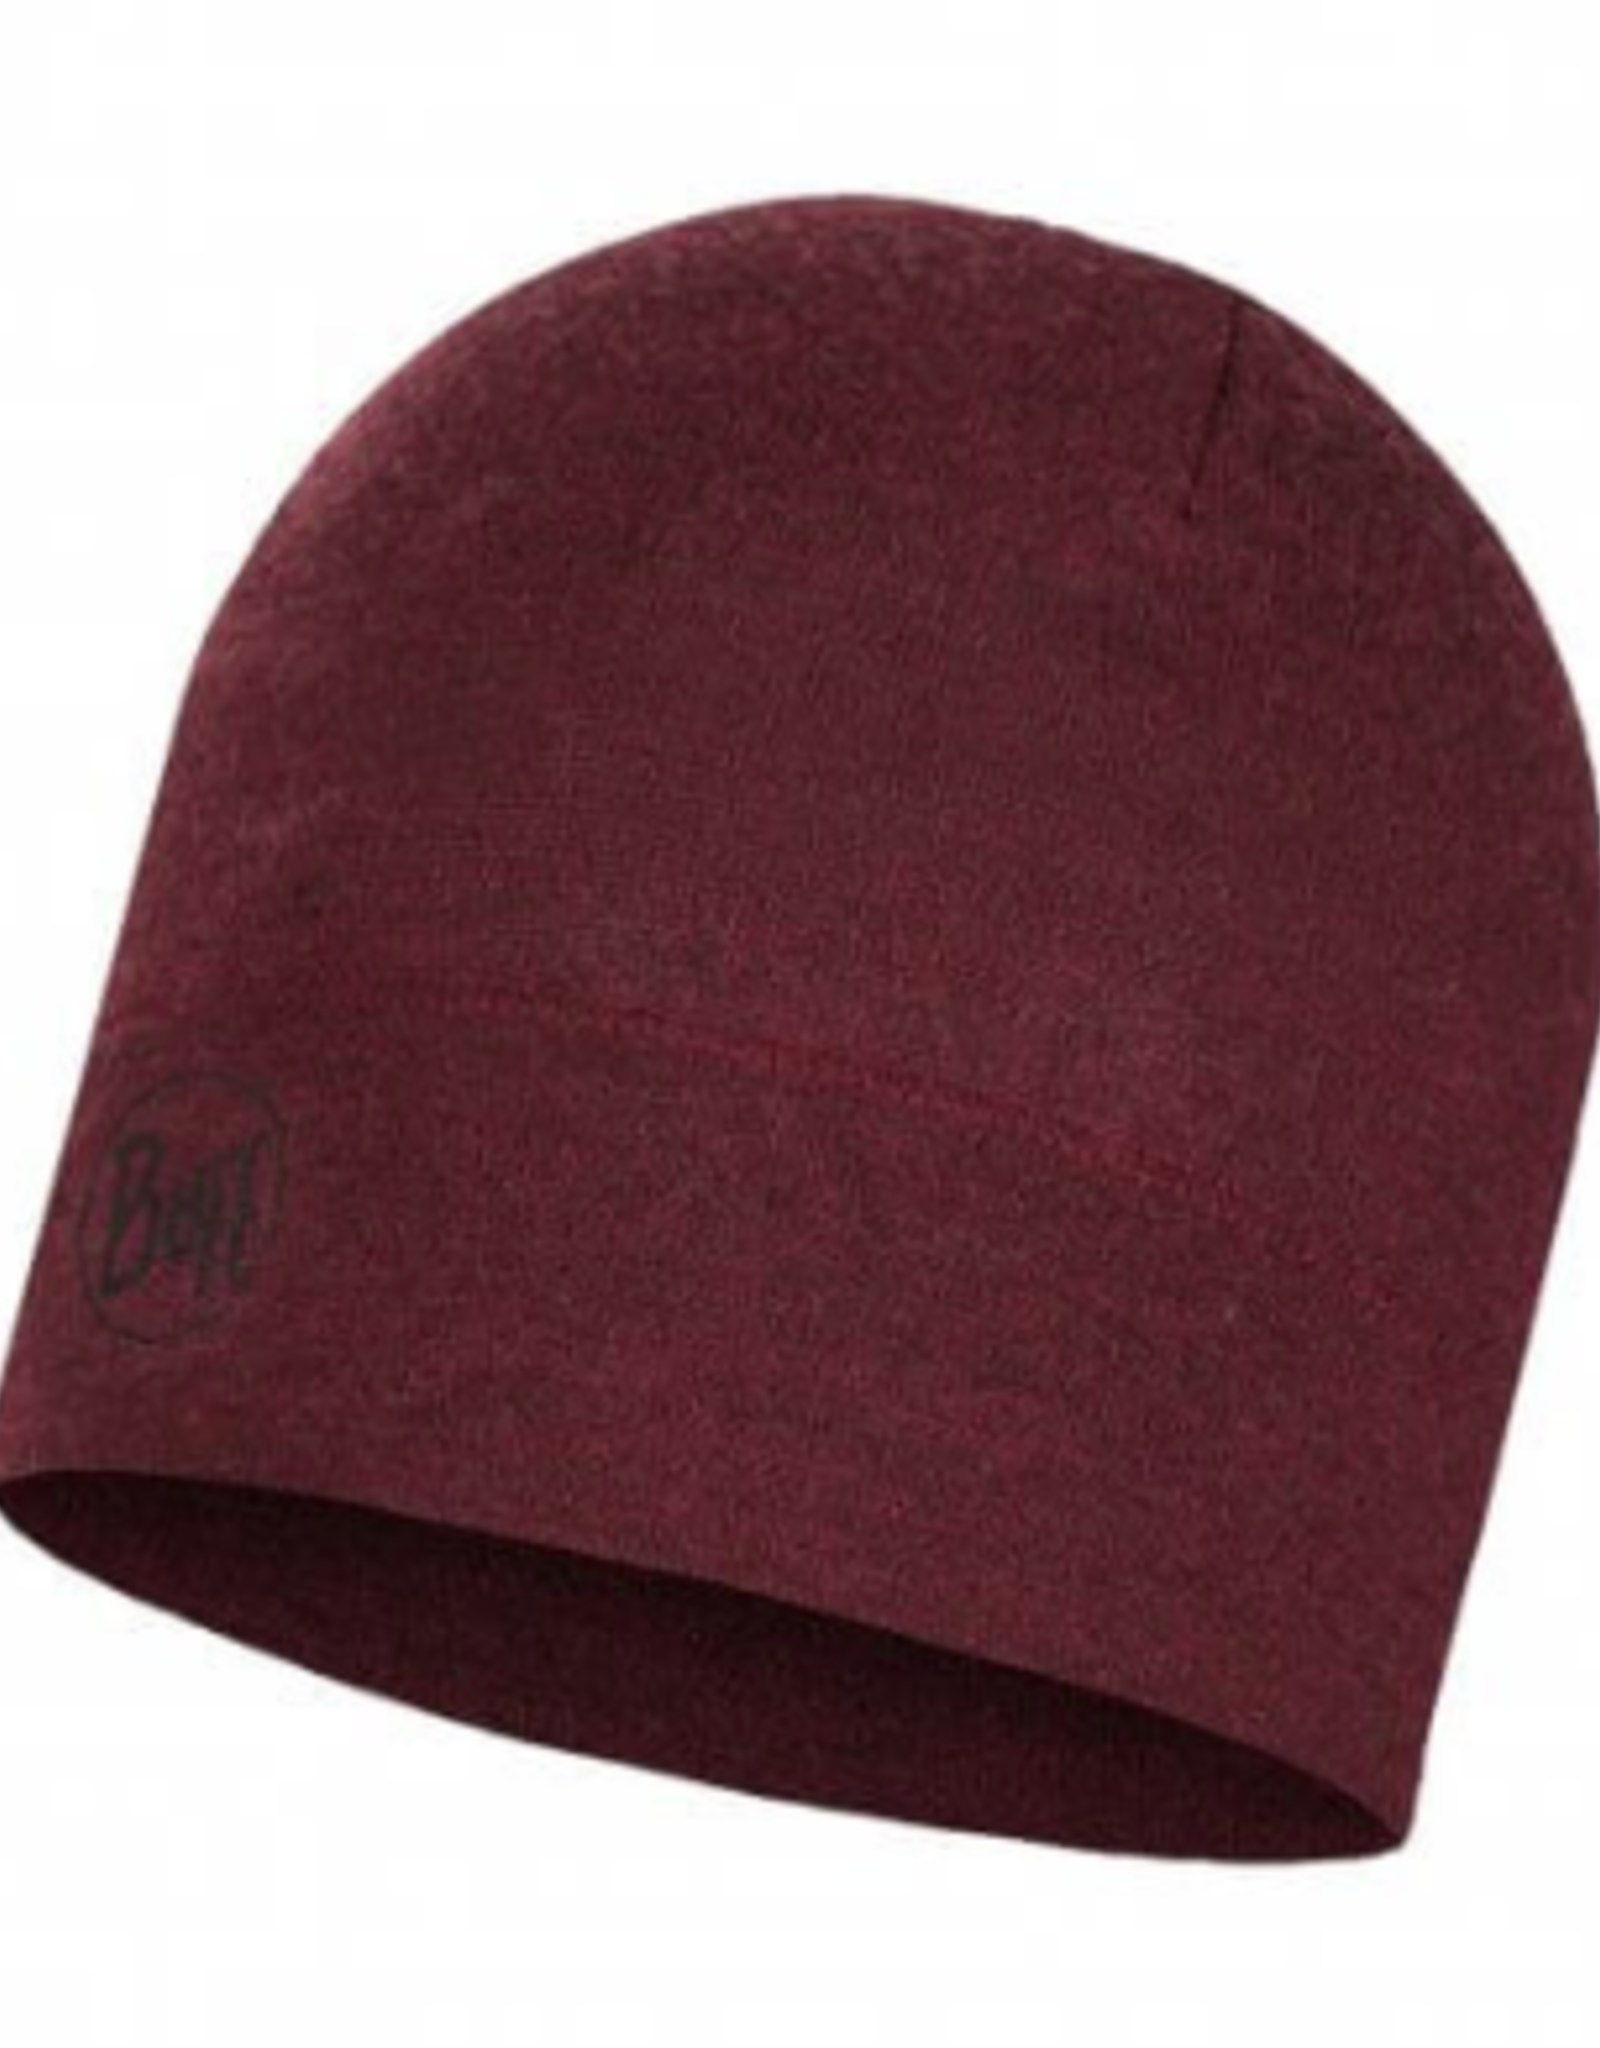 BUFF Wine Melange - Midweight Merino Wool Hat BUFF®